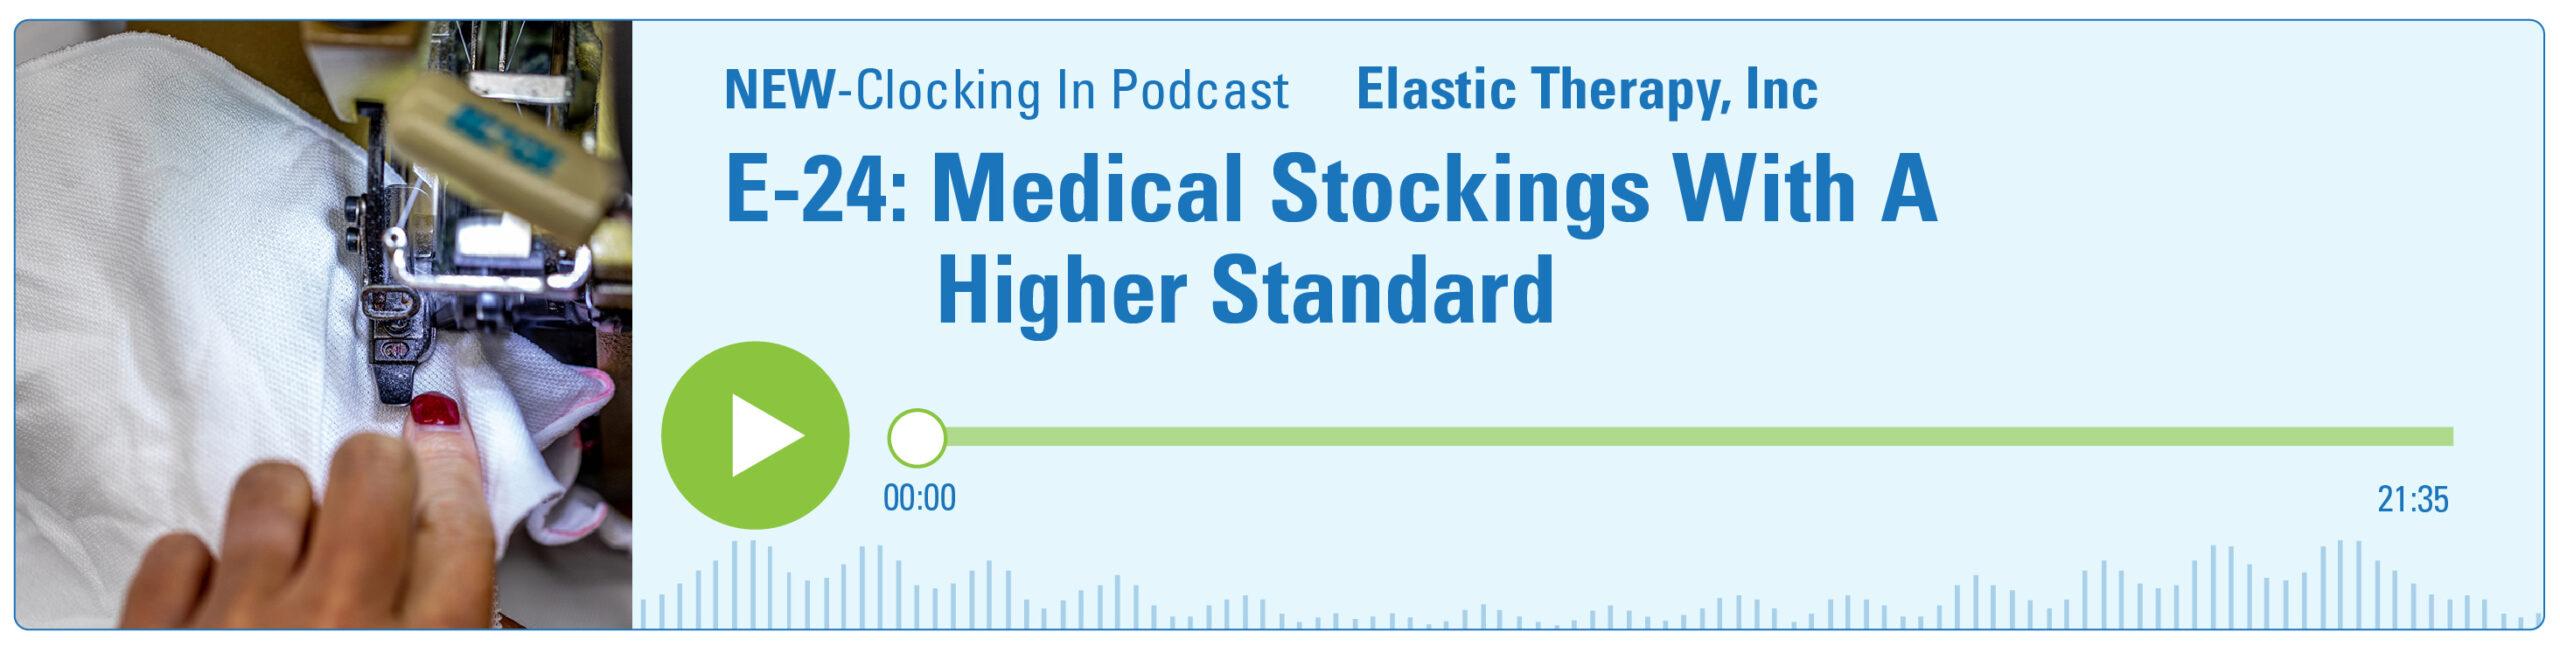 E-24 Podcast_Elastic Therapy Small Hero Banner Image